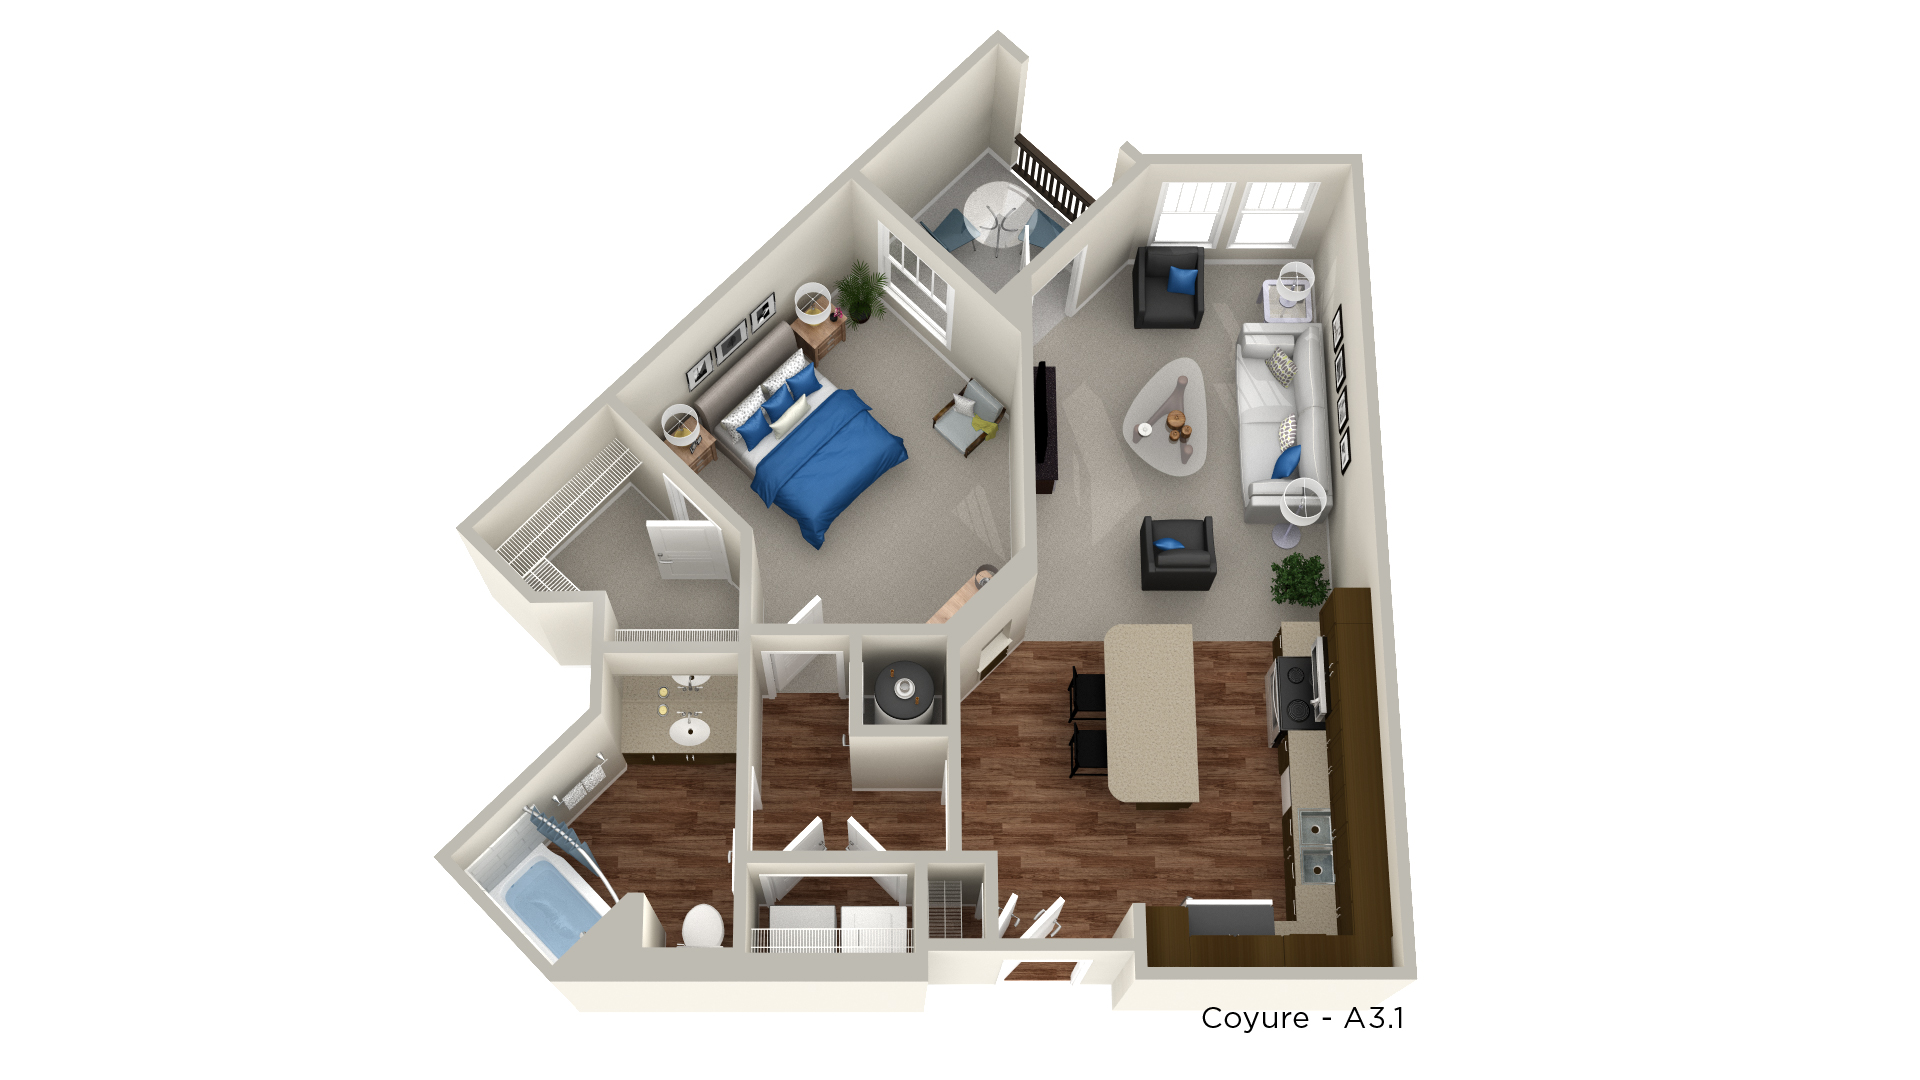 Floorplan - Coyure image